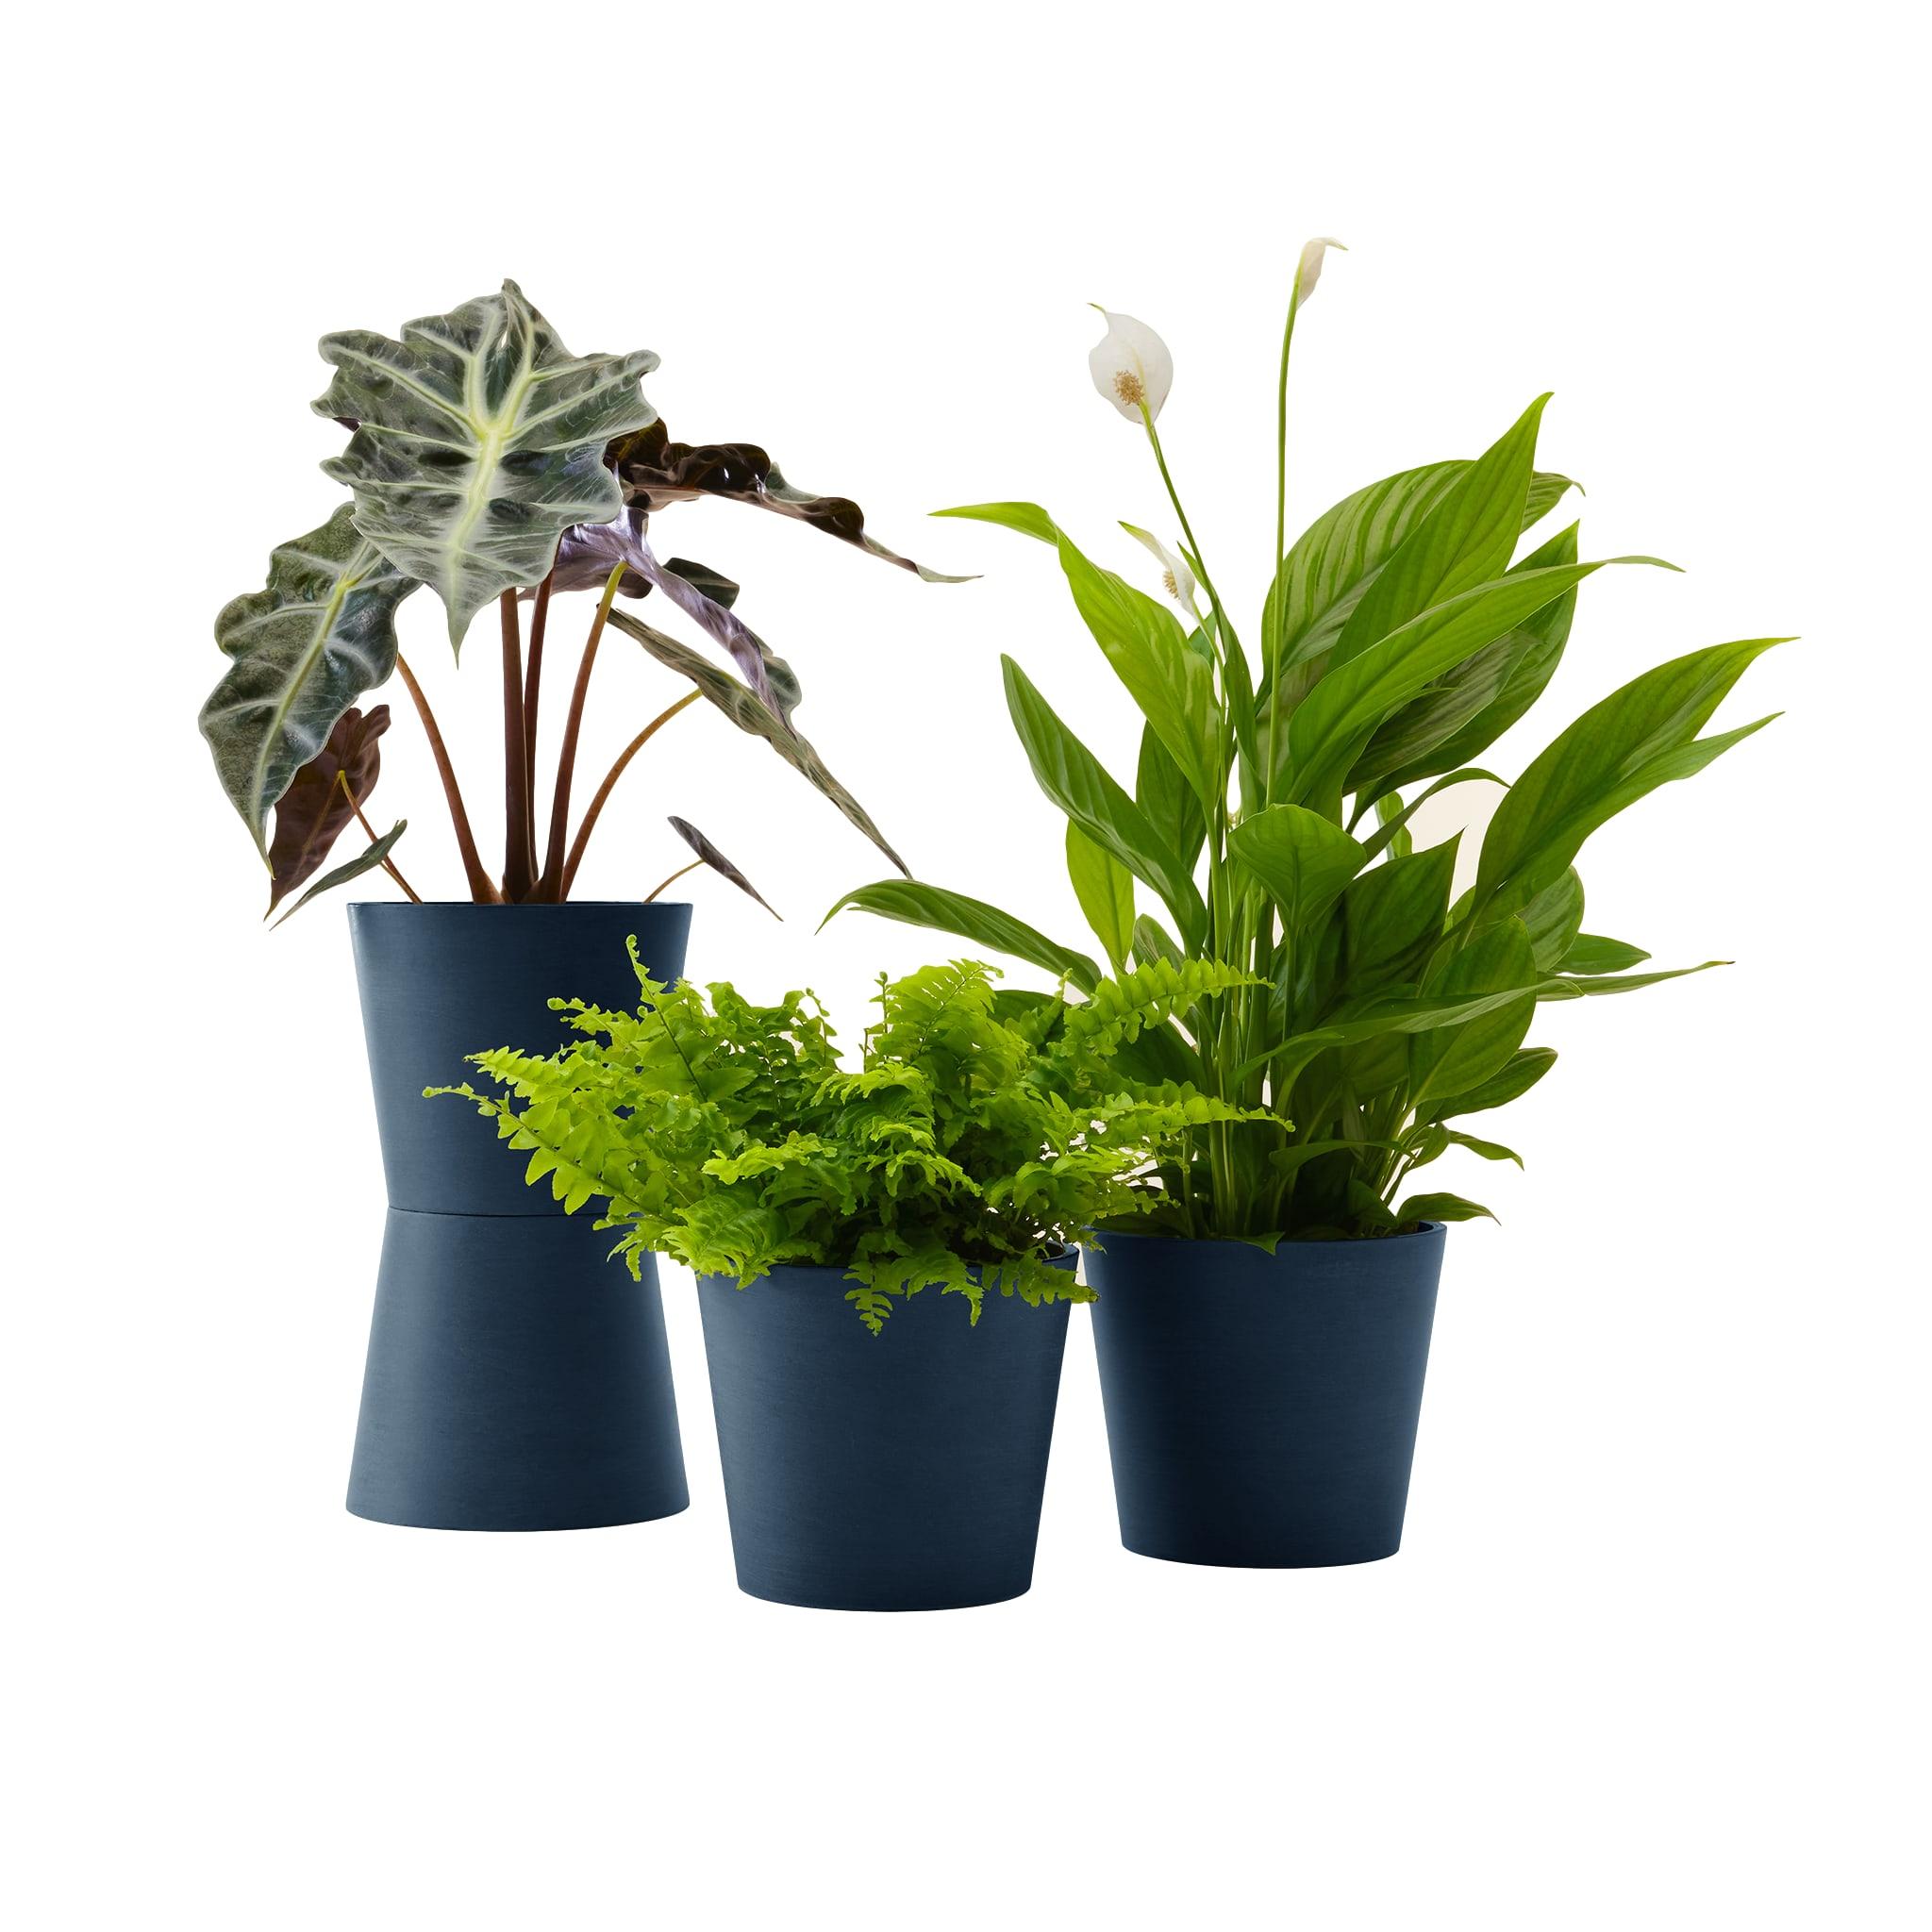 Plante - Spathiphyllum, Bananier, Nephrolepis pot bleu nuit